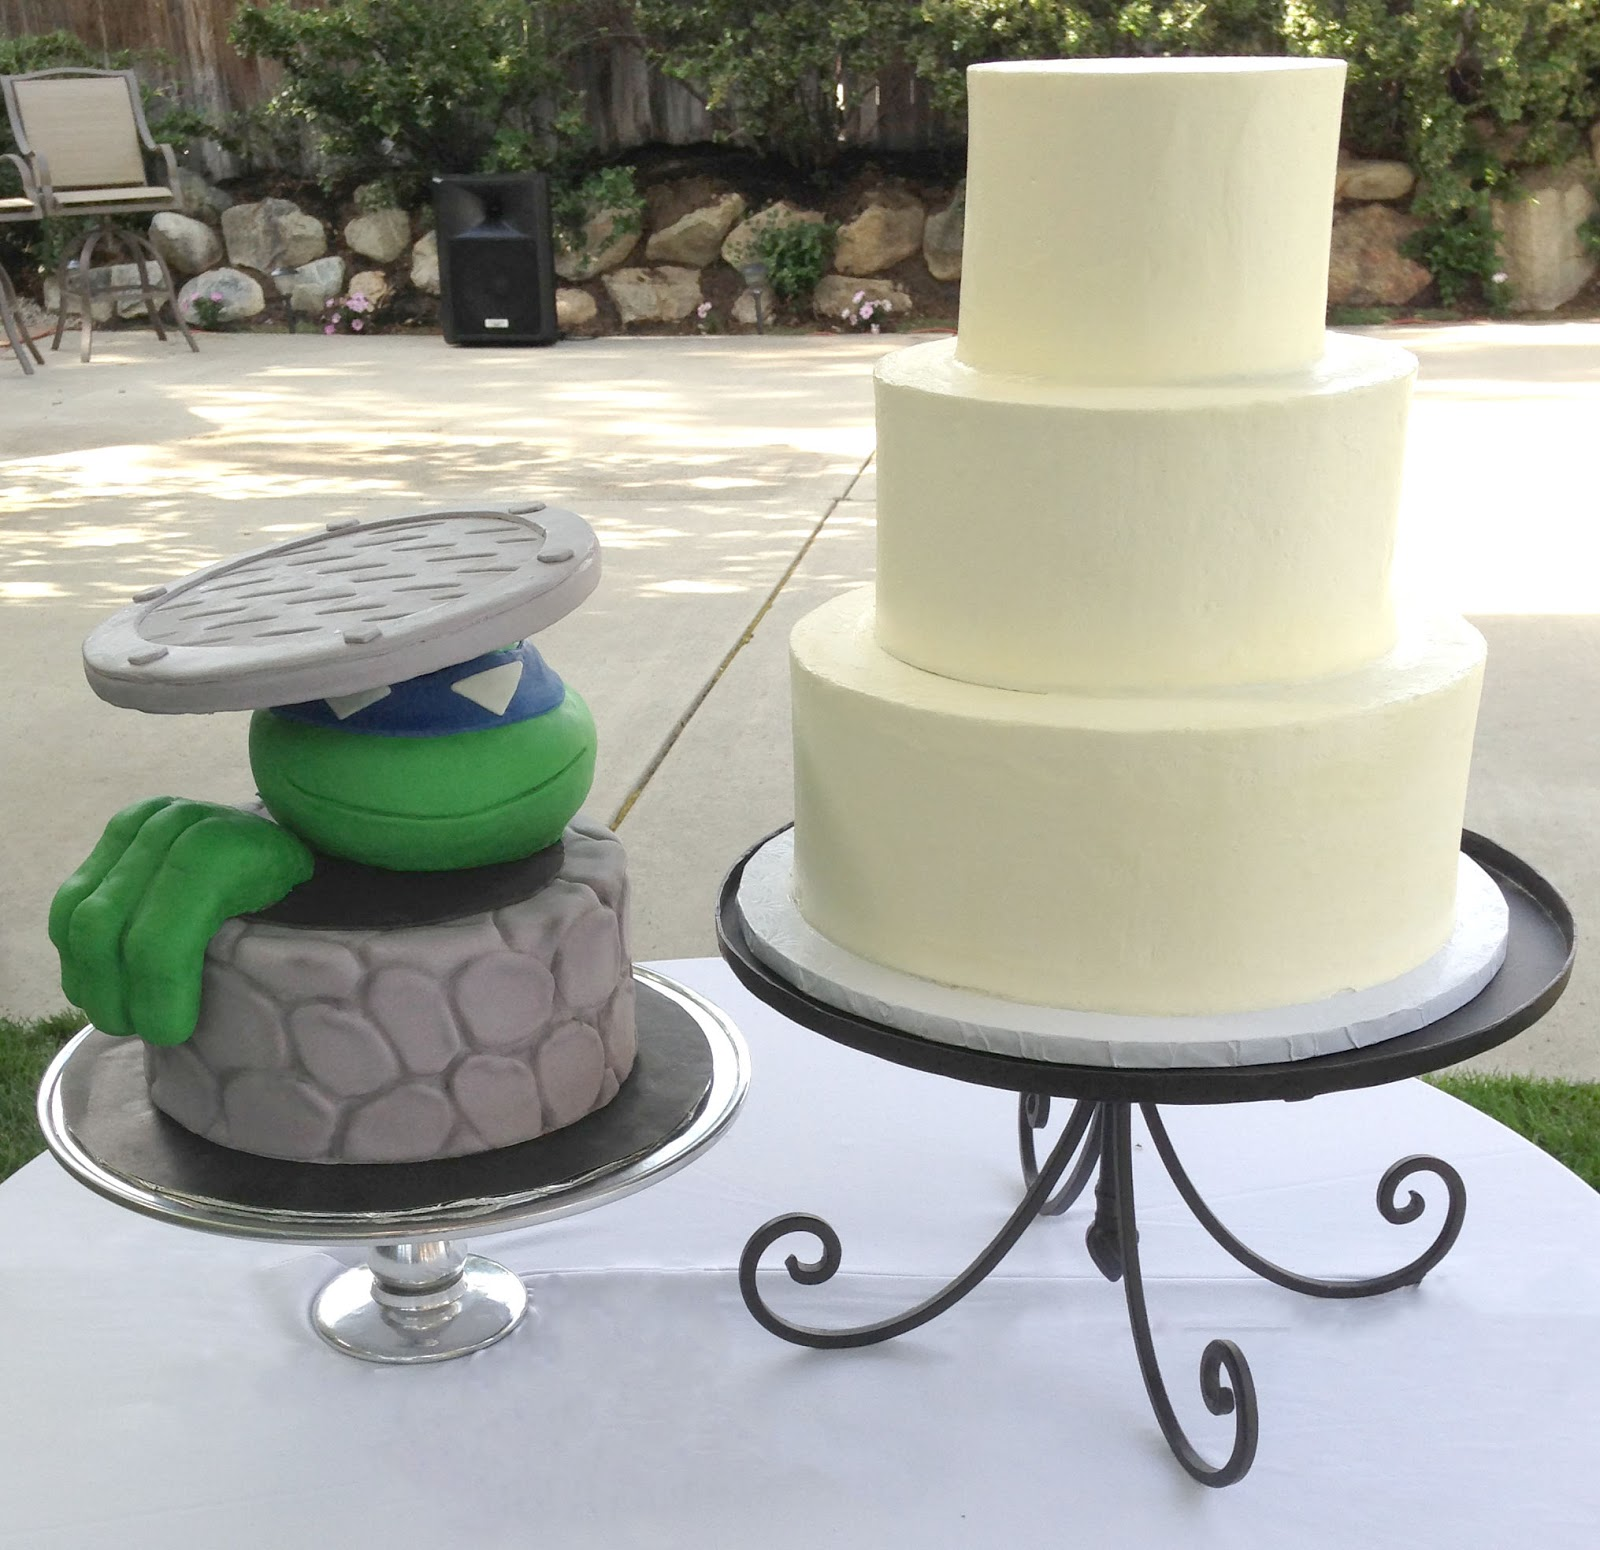 The Cake Market: White Wedding Cake and Ninja Turtle Groom\'s Cake